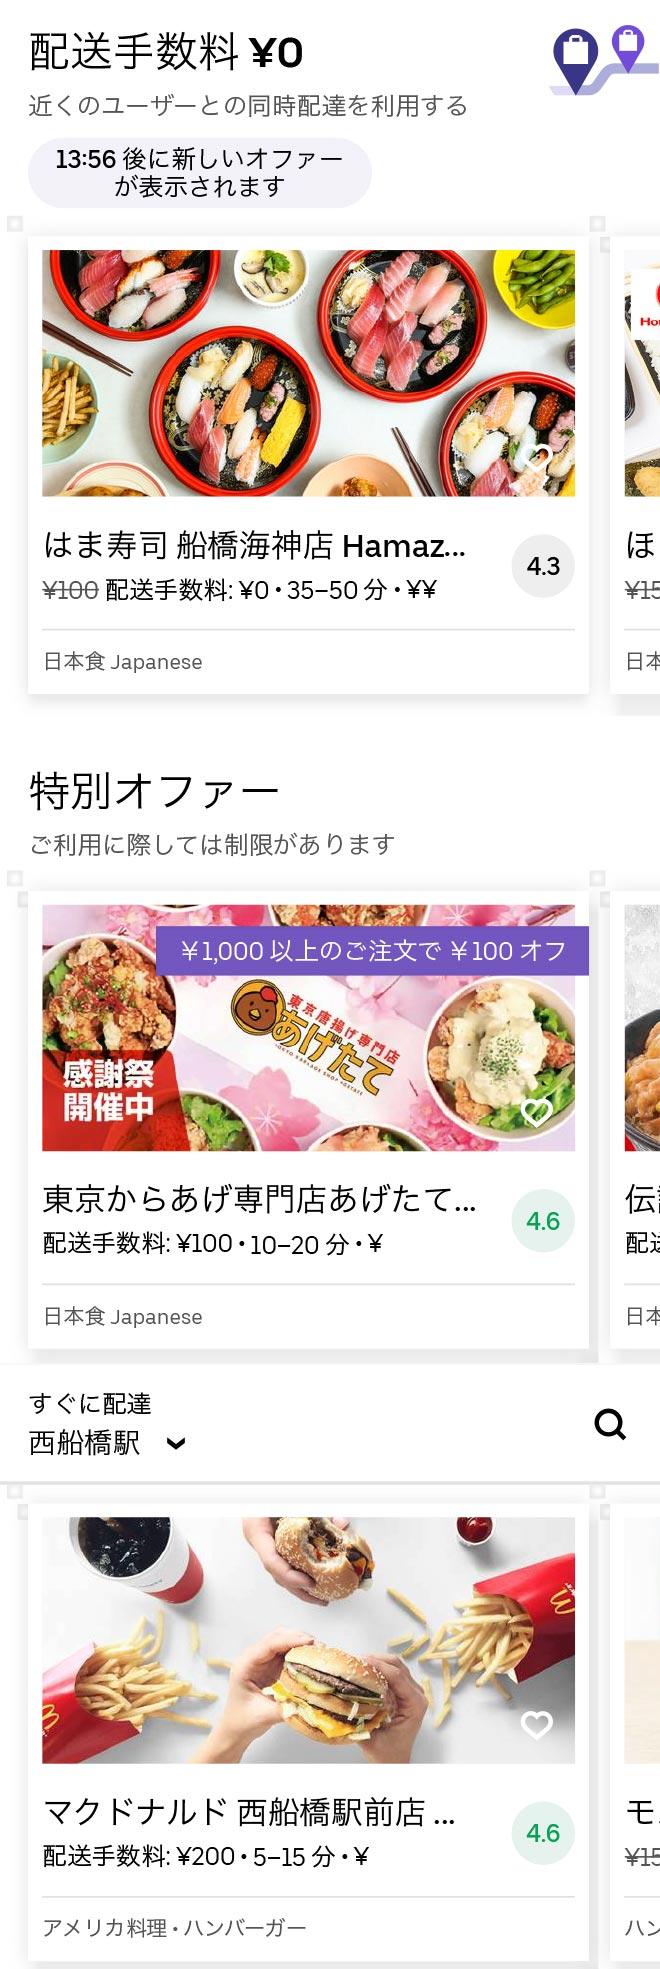 Nishi funabashi menu 2008 01